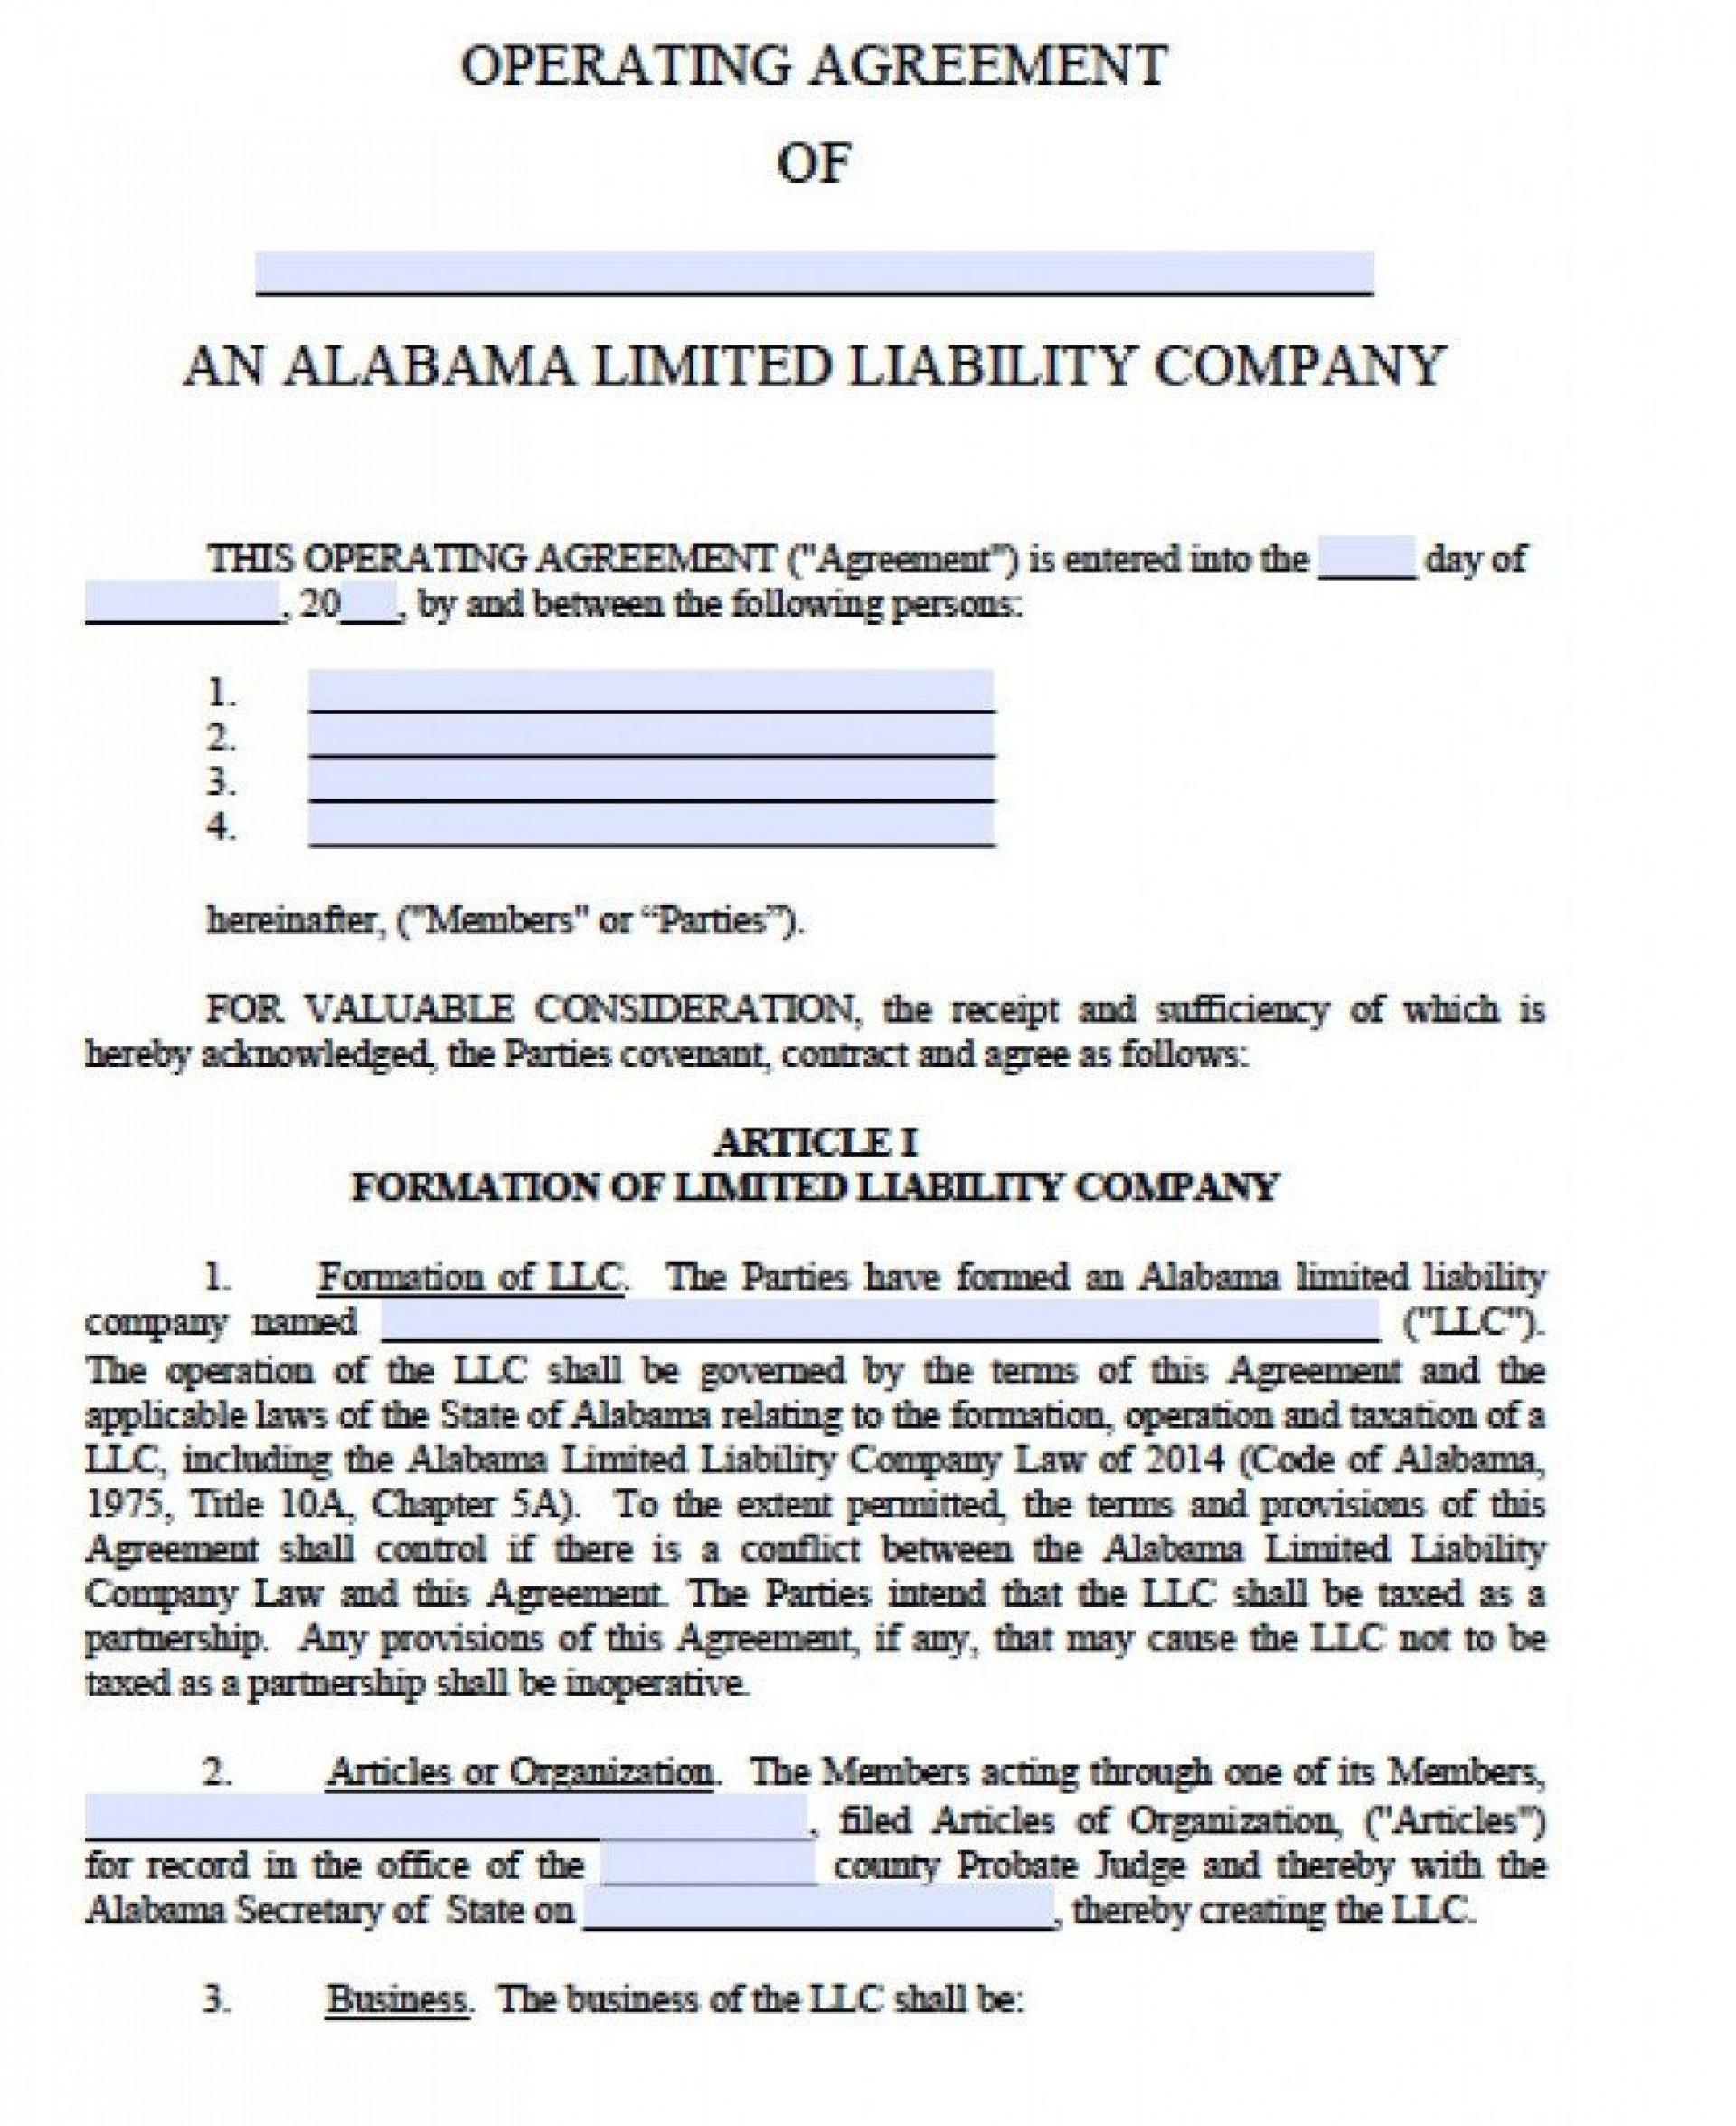 002 Marvelou Llc Partnership Agreement Template High Def  Free Operating1920